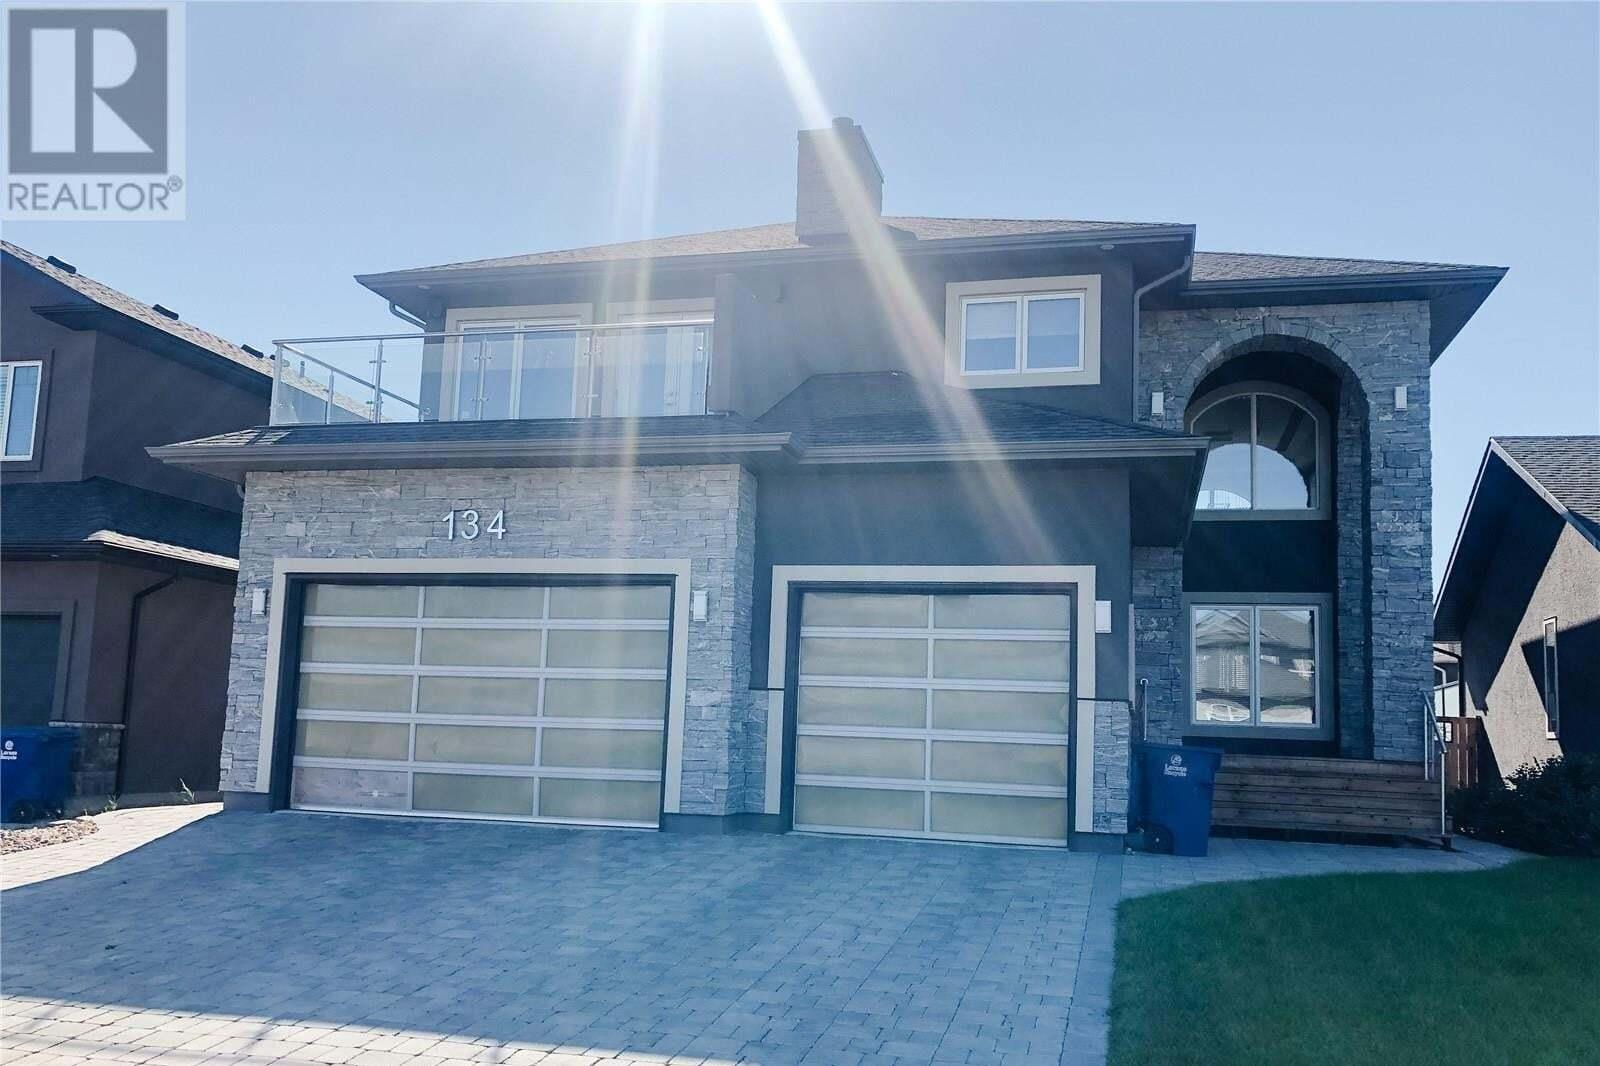 House for sale at 134 Roy Cres Saskatoon Saskatchewan - MLS: SK827009